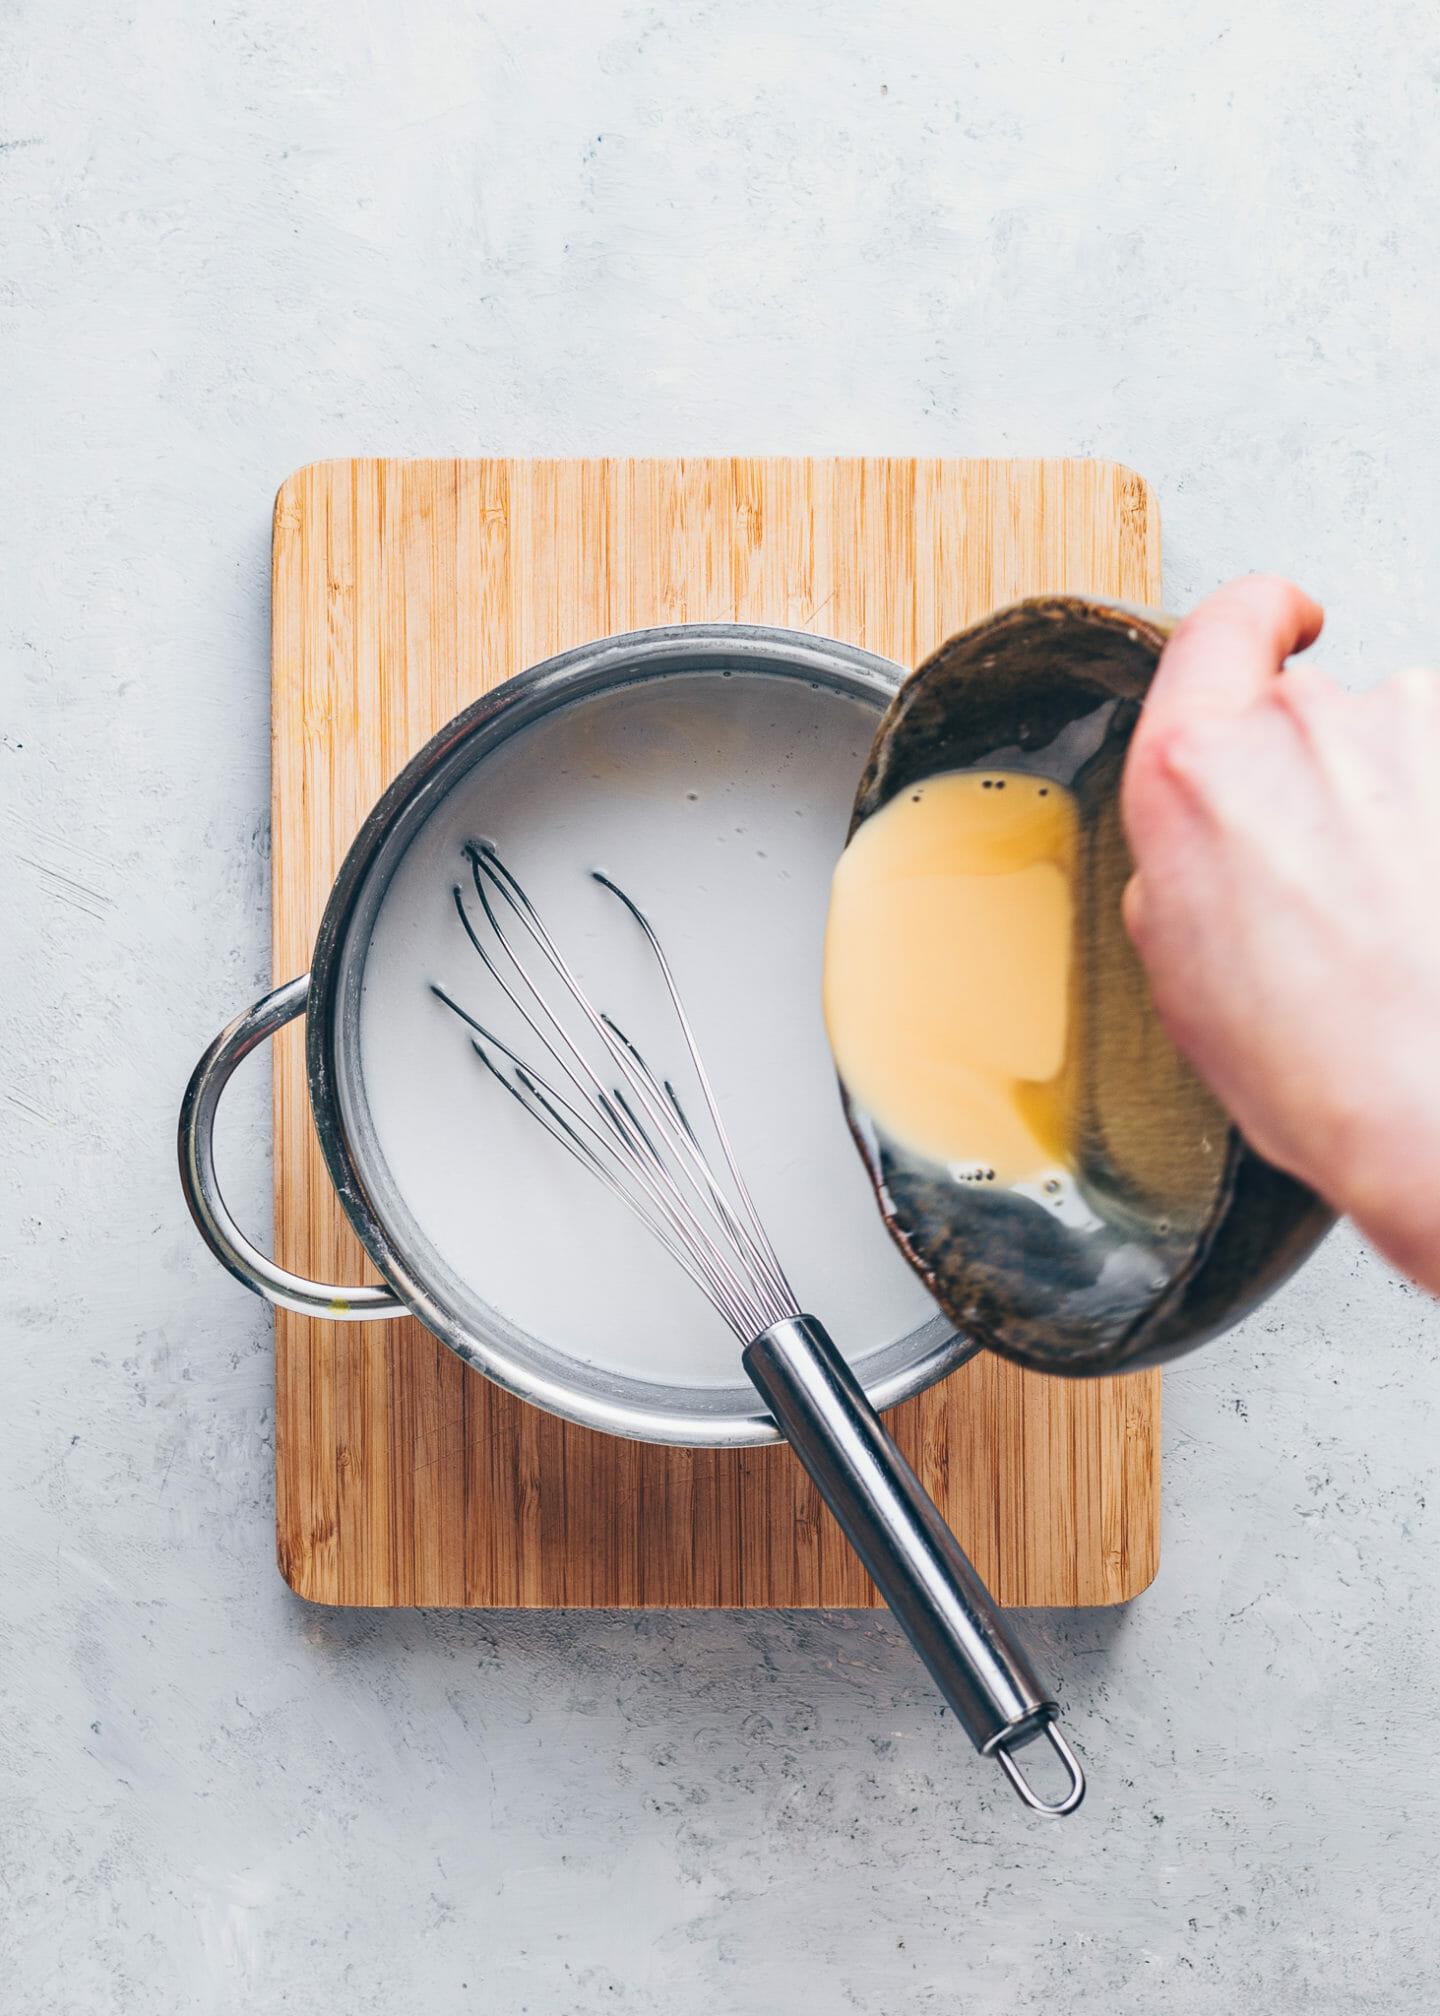 coconut milk in a saucepan to make custard